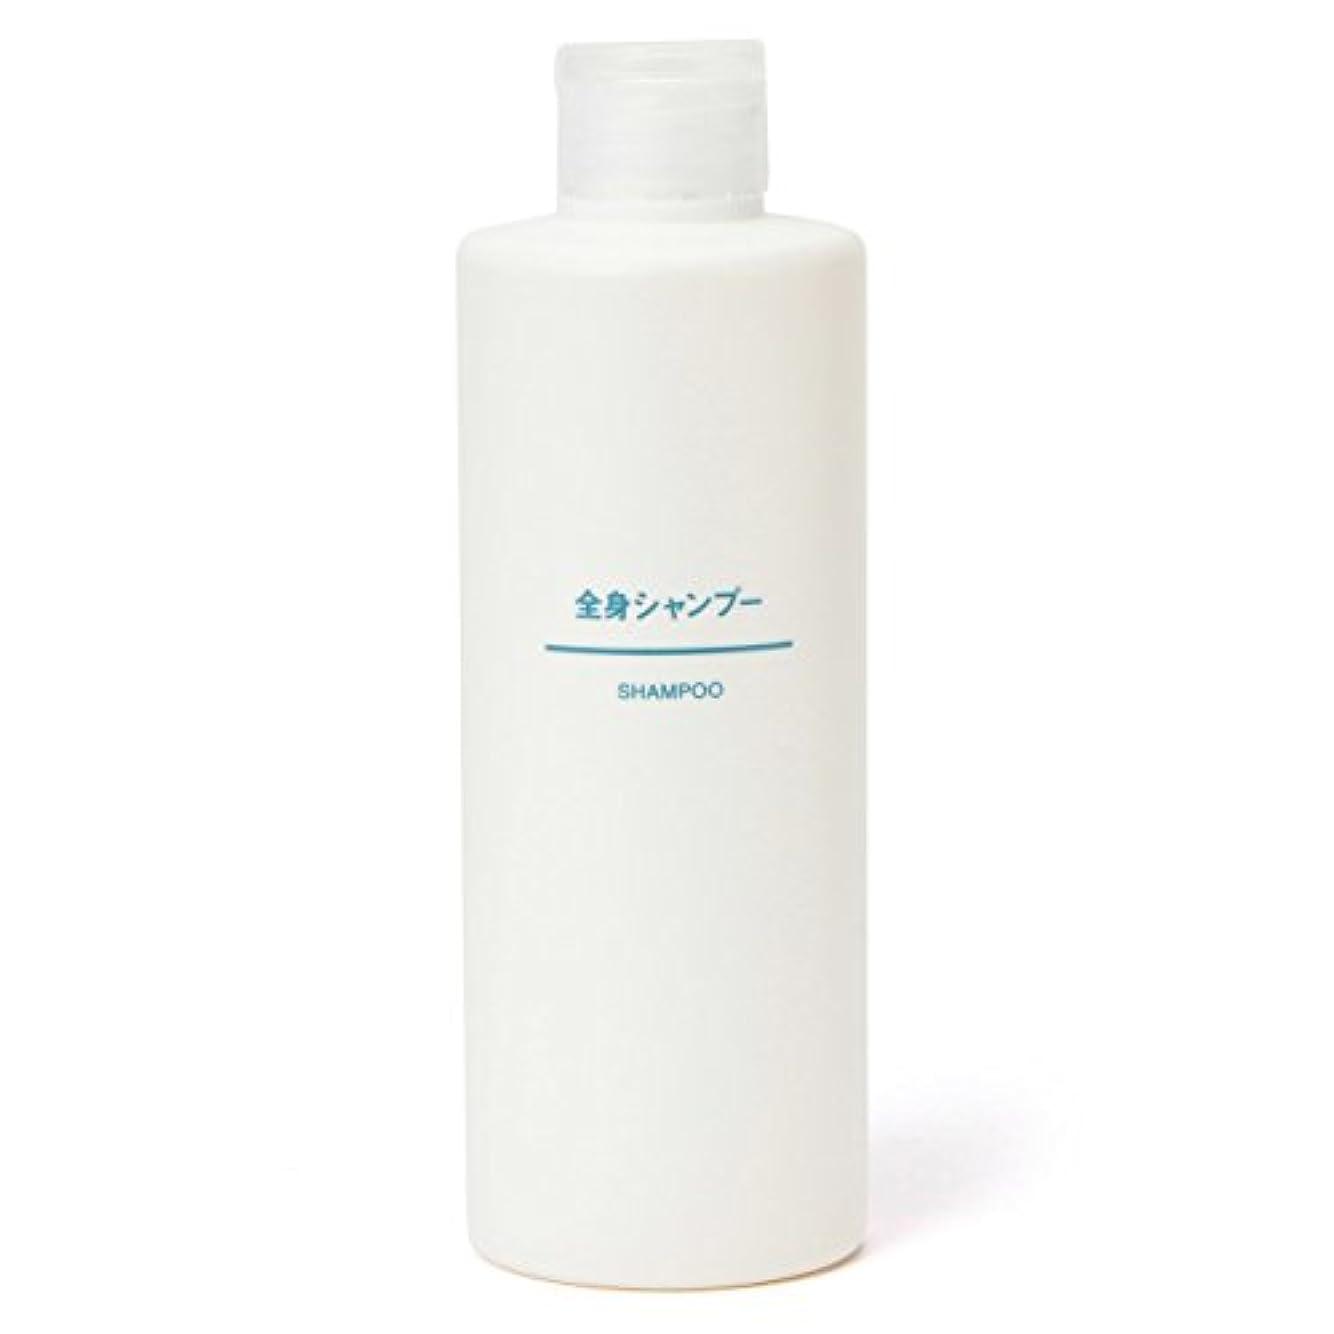 抽象議題件名無印良品 全身シャンプー 300ml 日本製